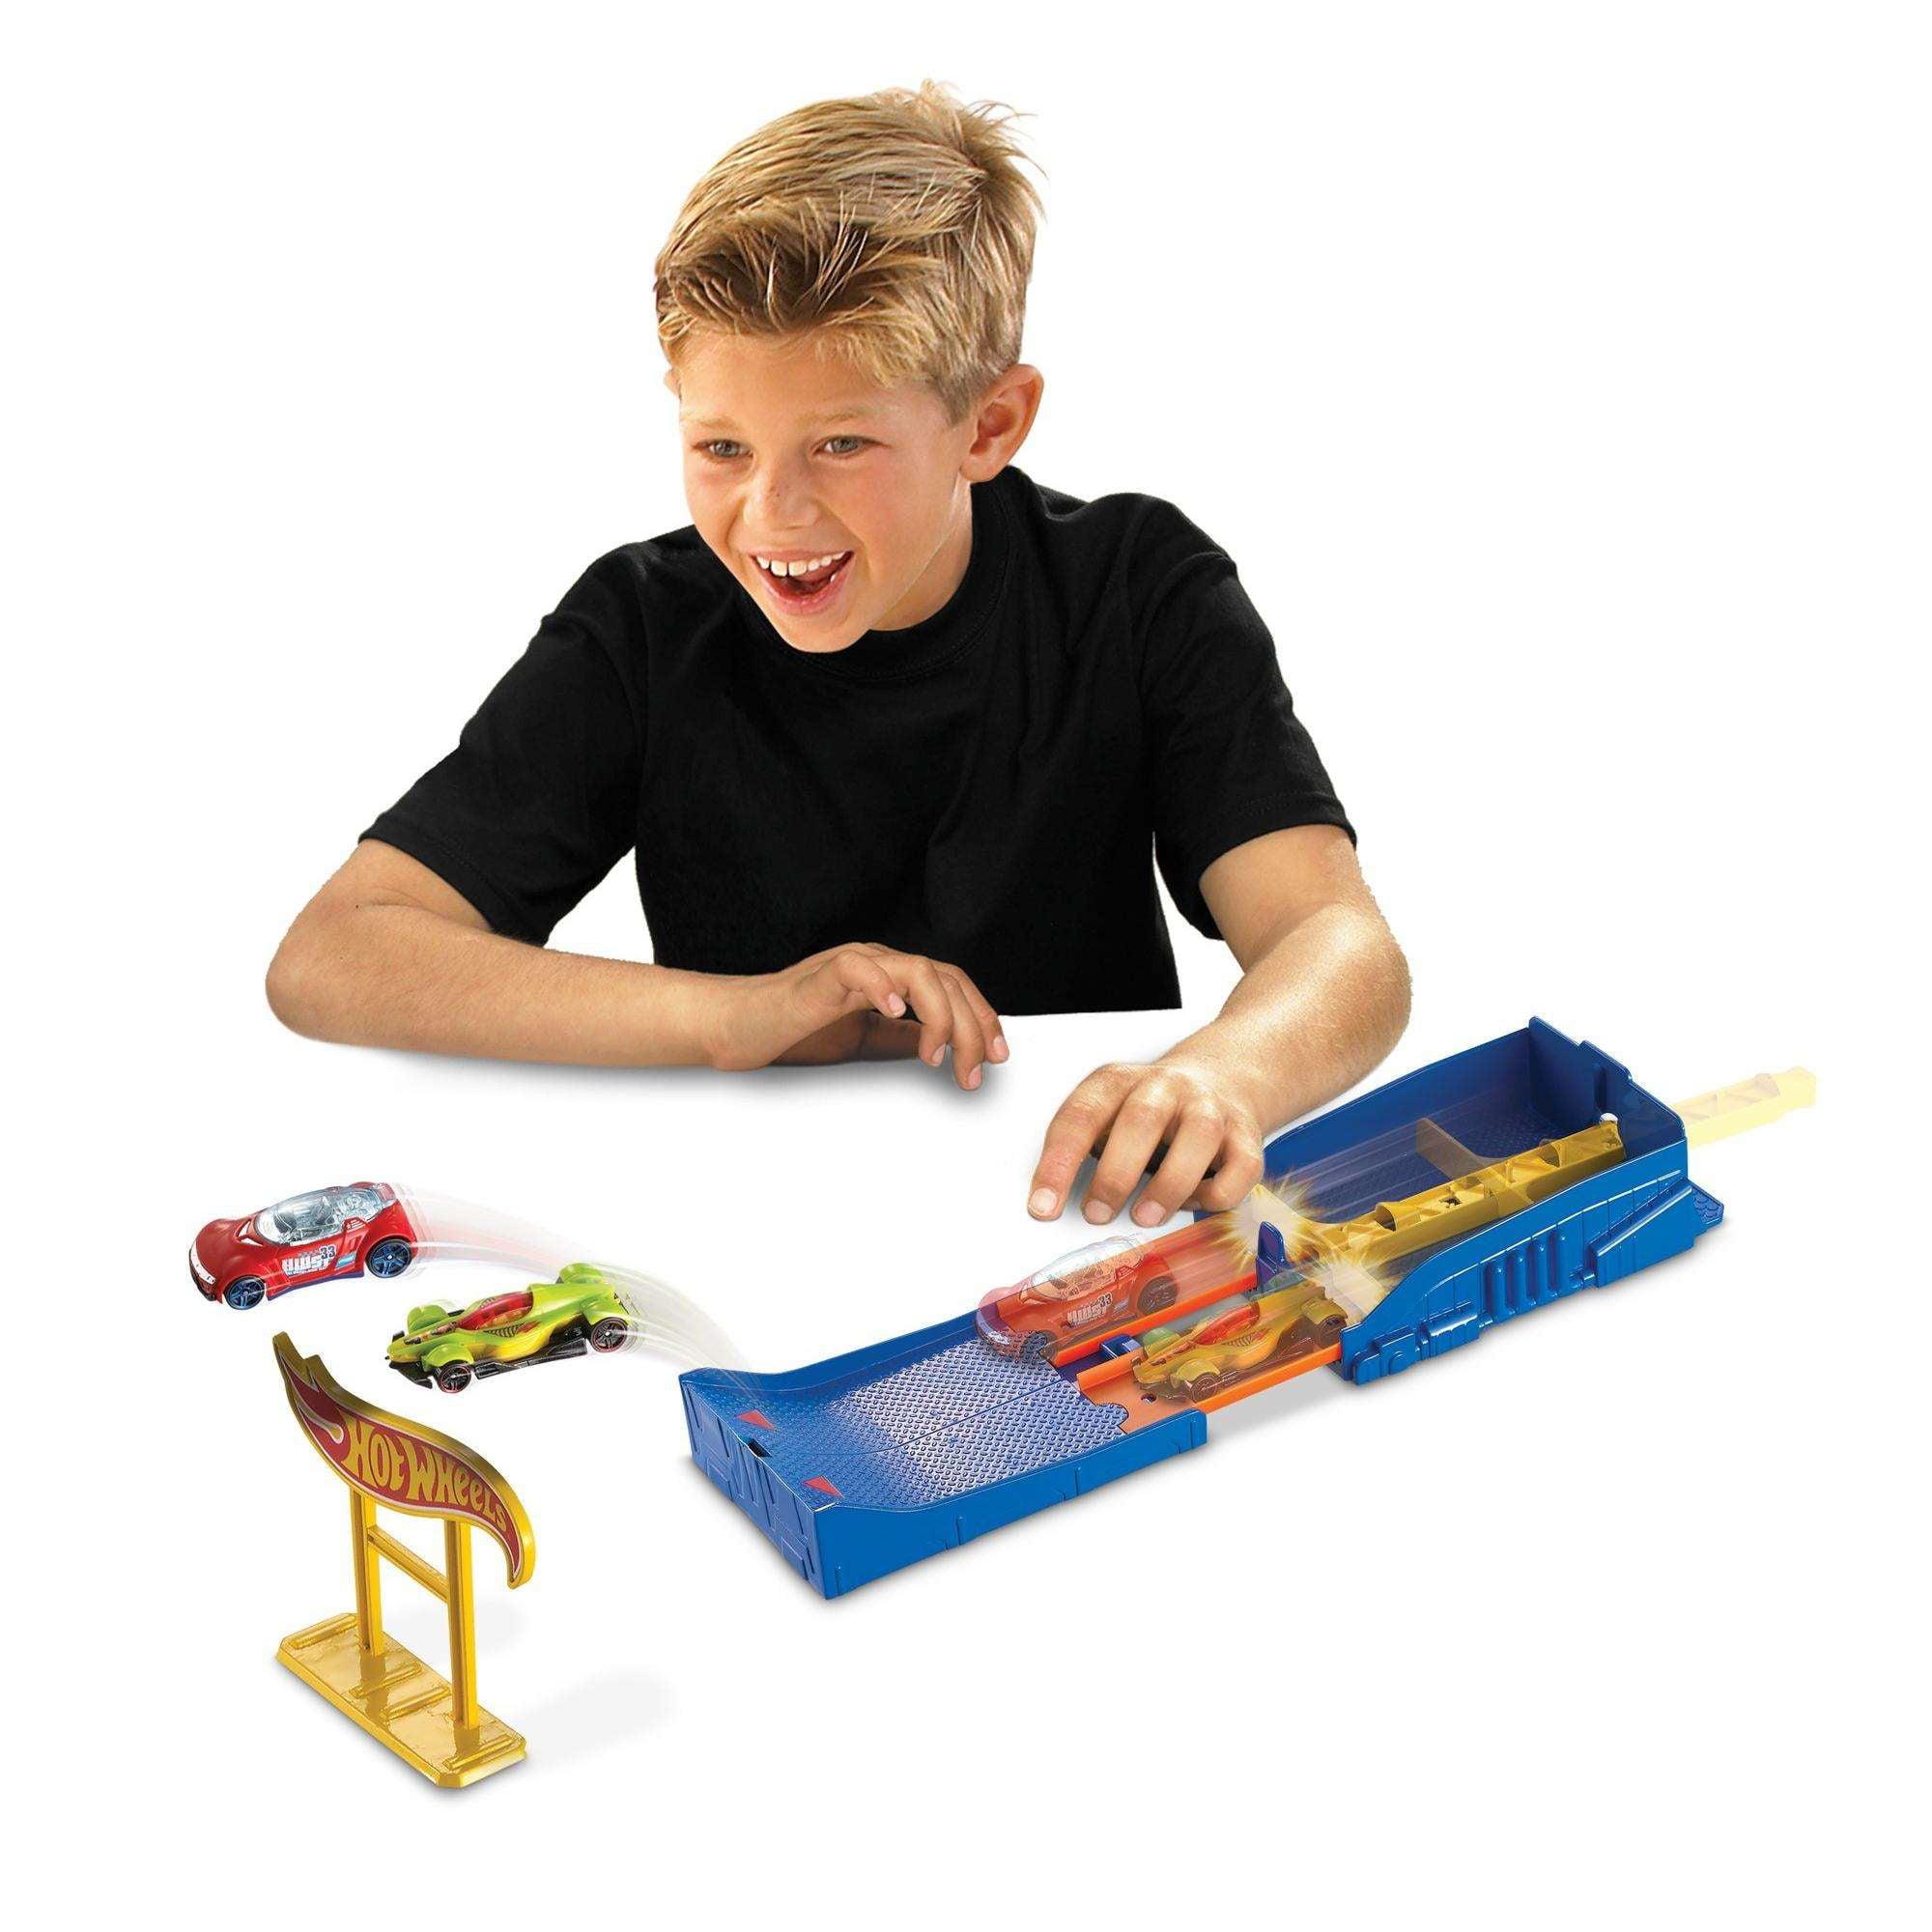 Hot Wheels Pocket Raceway Track Set by Mattel